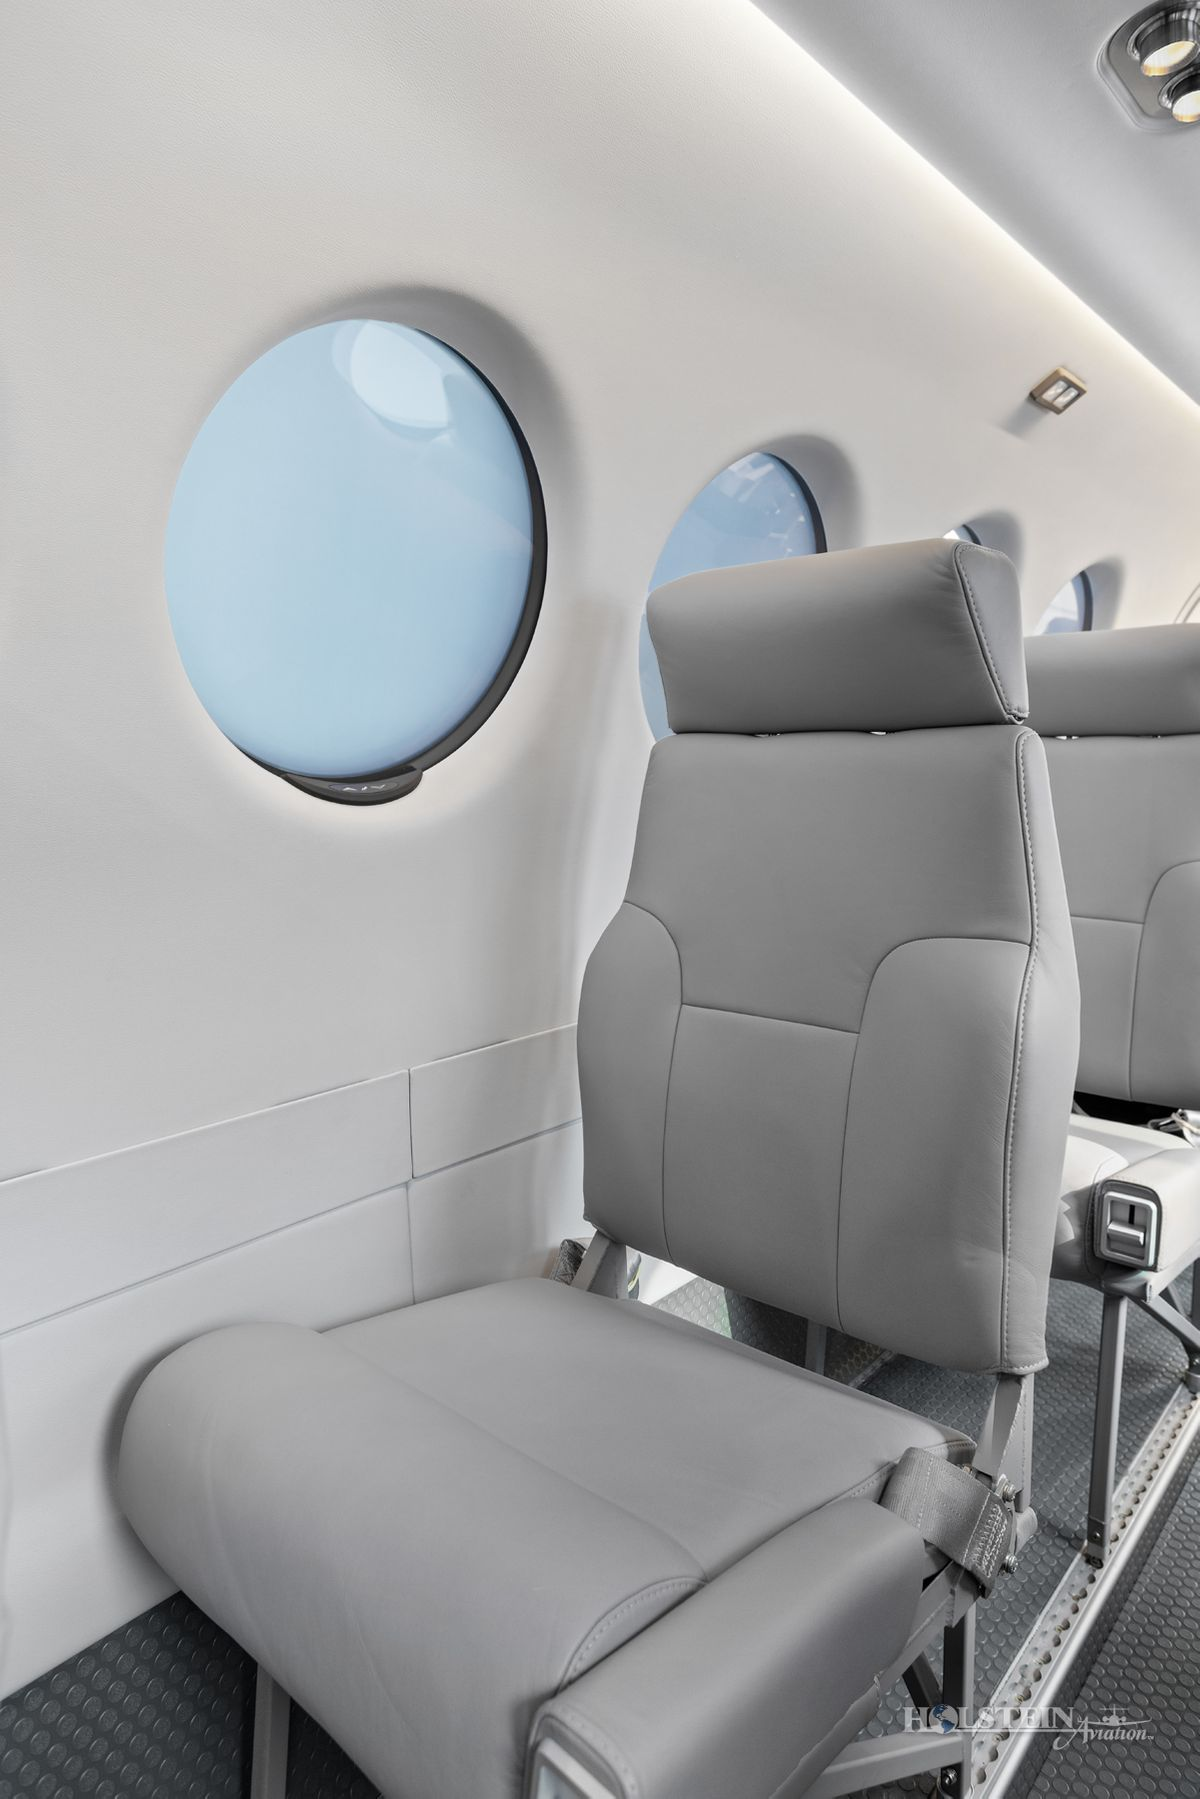 2018 King Air 350iER - FL-1157 - N1157F - Int - Seat CU 3 RGB.jpg